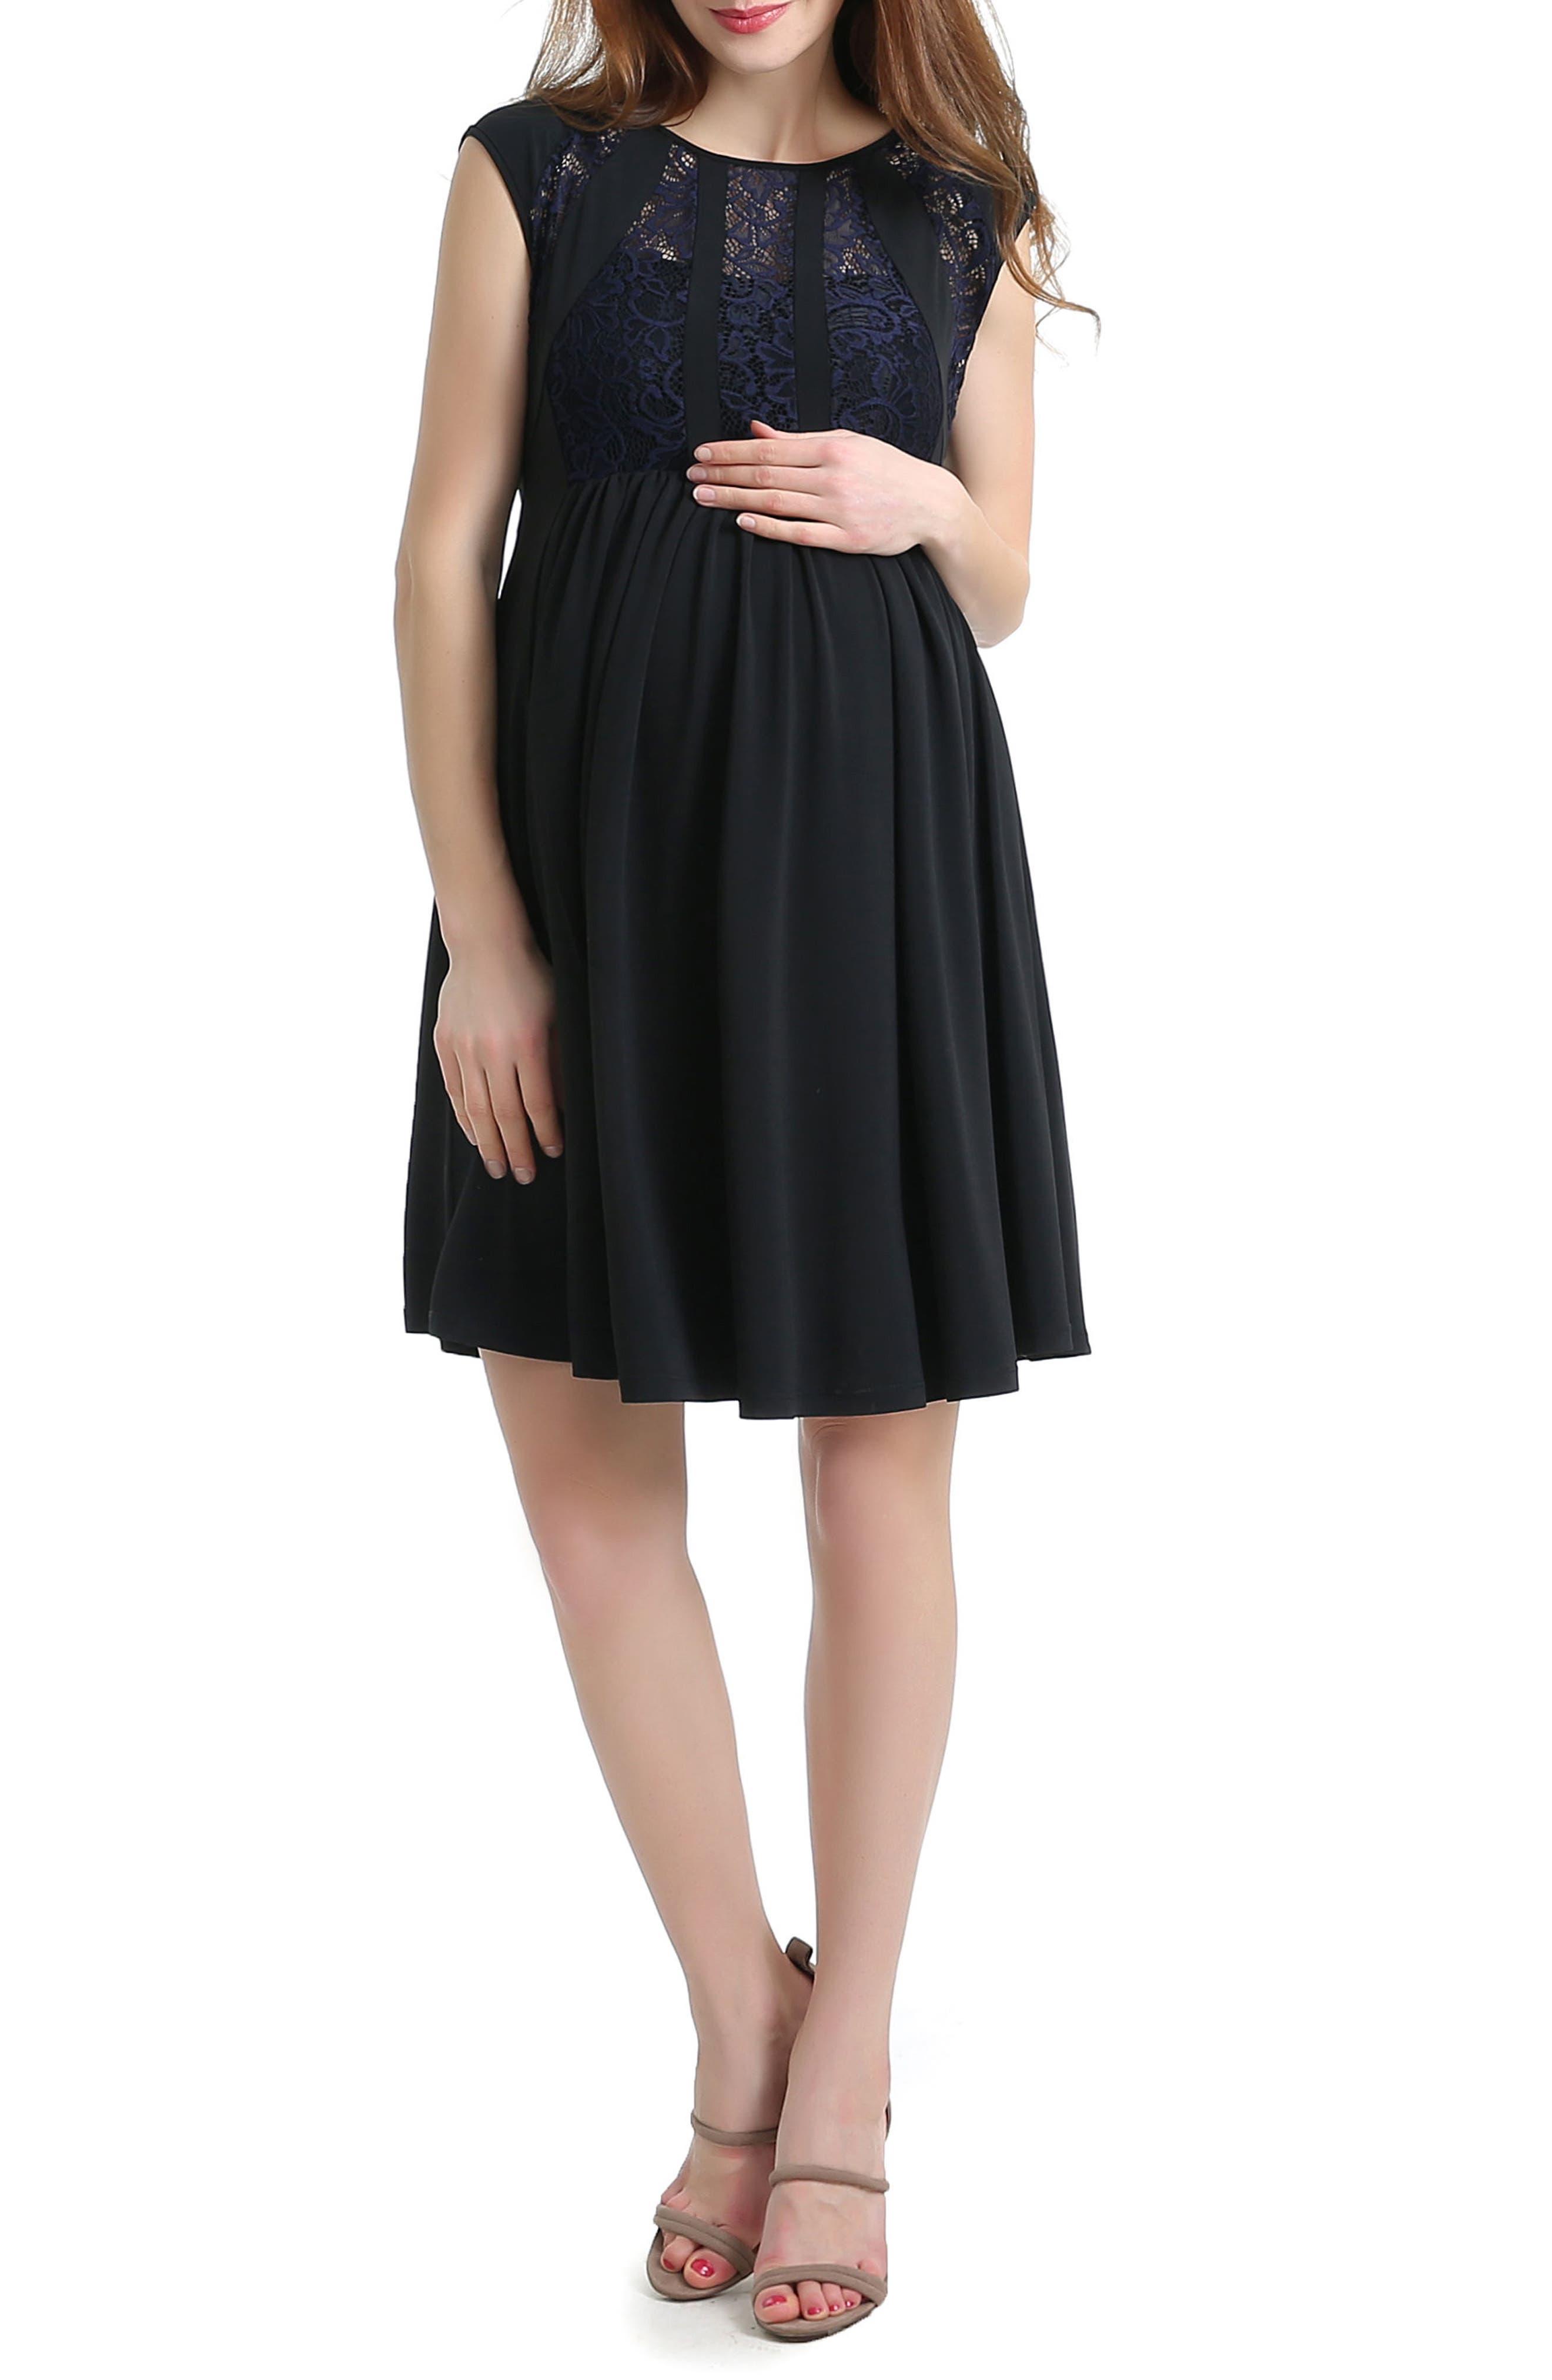 Cocktail maternity dress